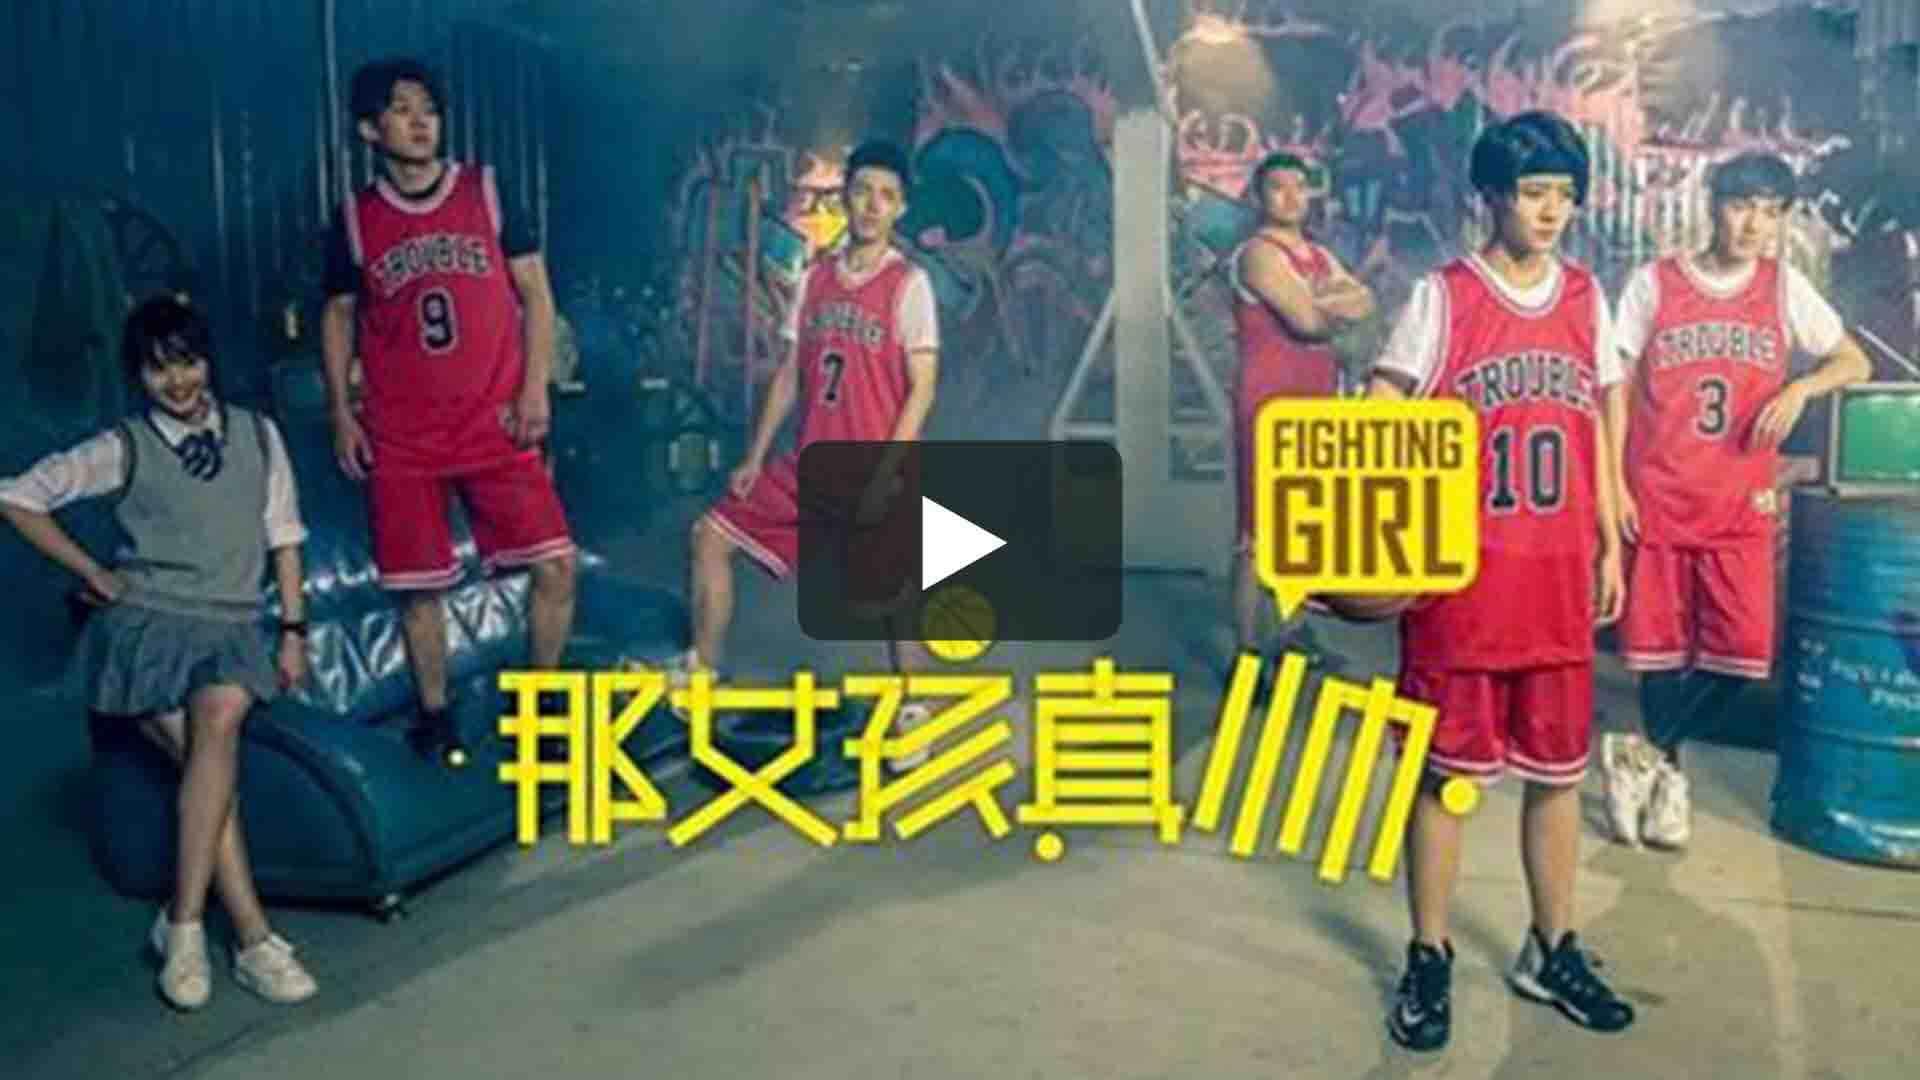 那女孩真帥 - Fightting Girl